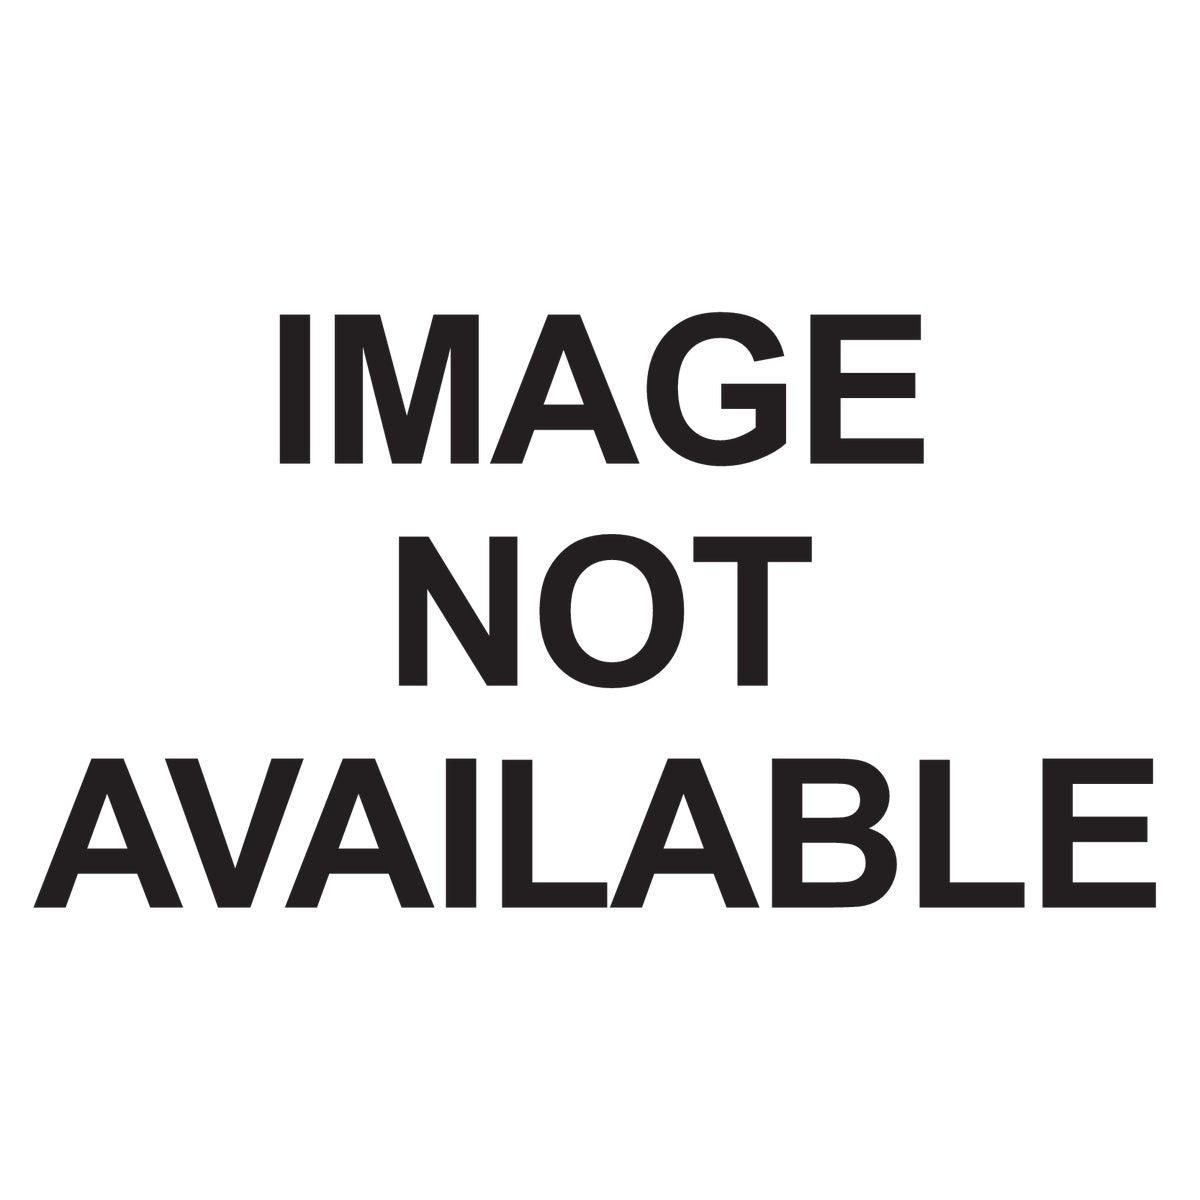 5GAL LVOC BOND ADHESIVE - W59GT30124 by Gentite Rrs  Rsc